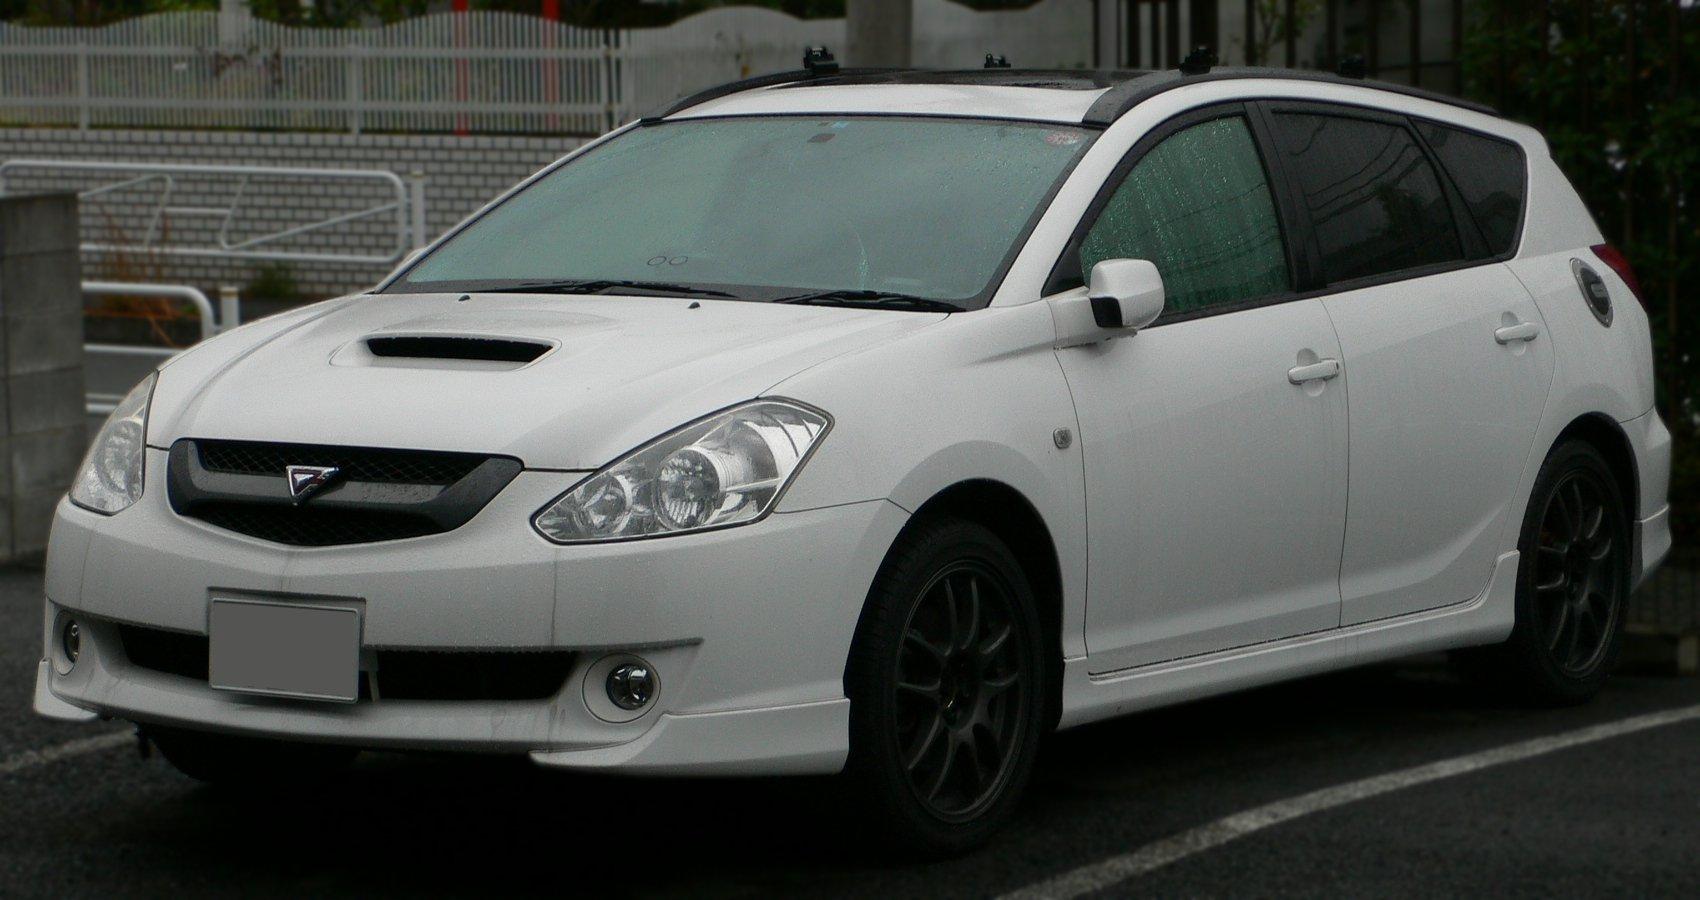 Toyota Celica 2016 >> File:2002 Toyota Caldina 02.jpg - Wikimedia Commons